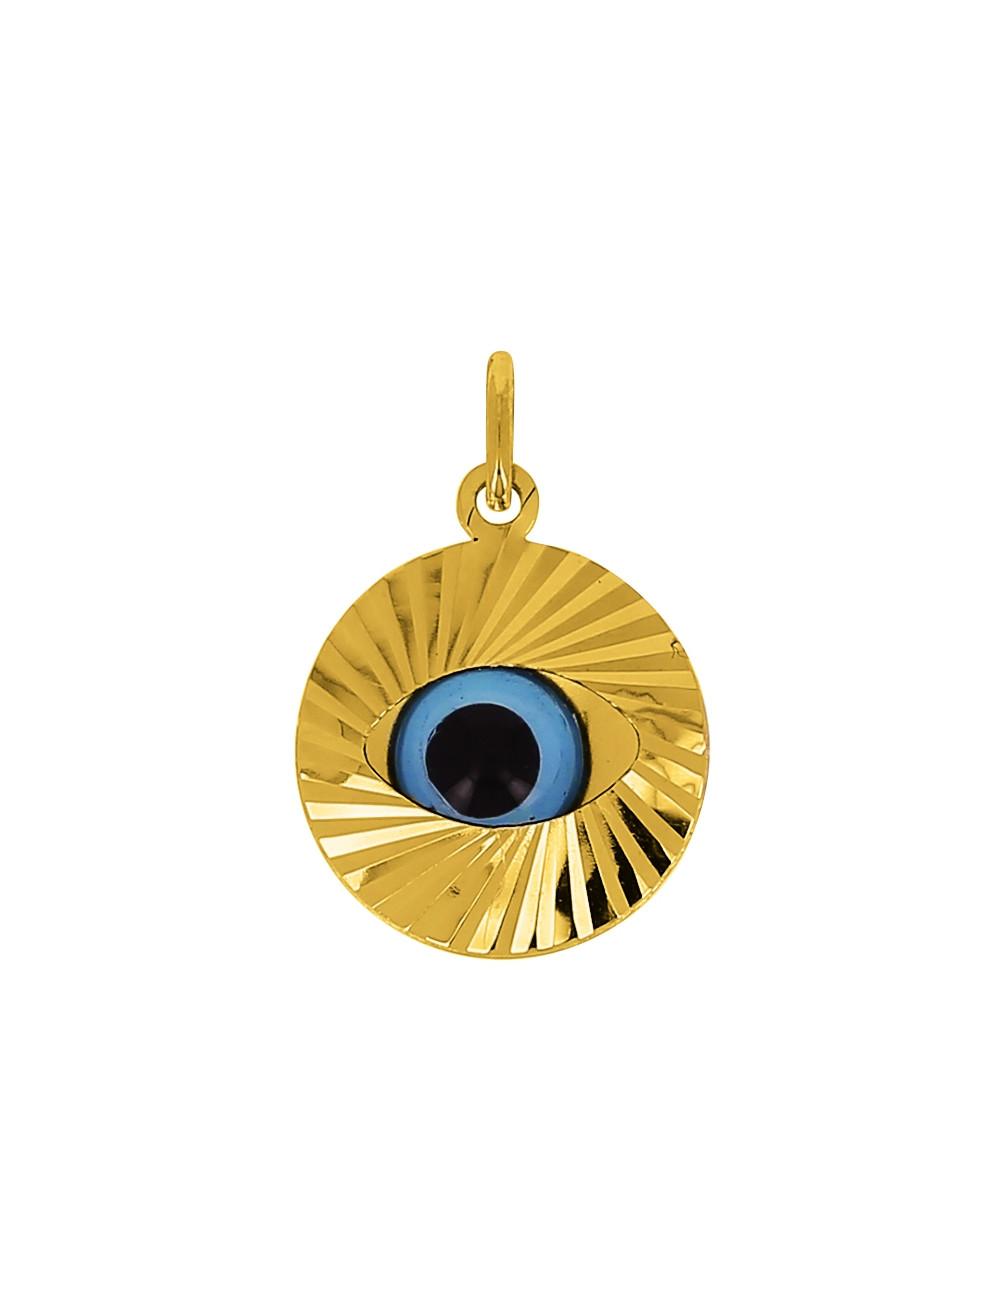 Pendentif Oeil Bleu Or Jaune 18 Carats + Chaine Or Jaune OFFERTE